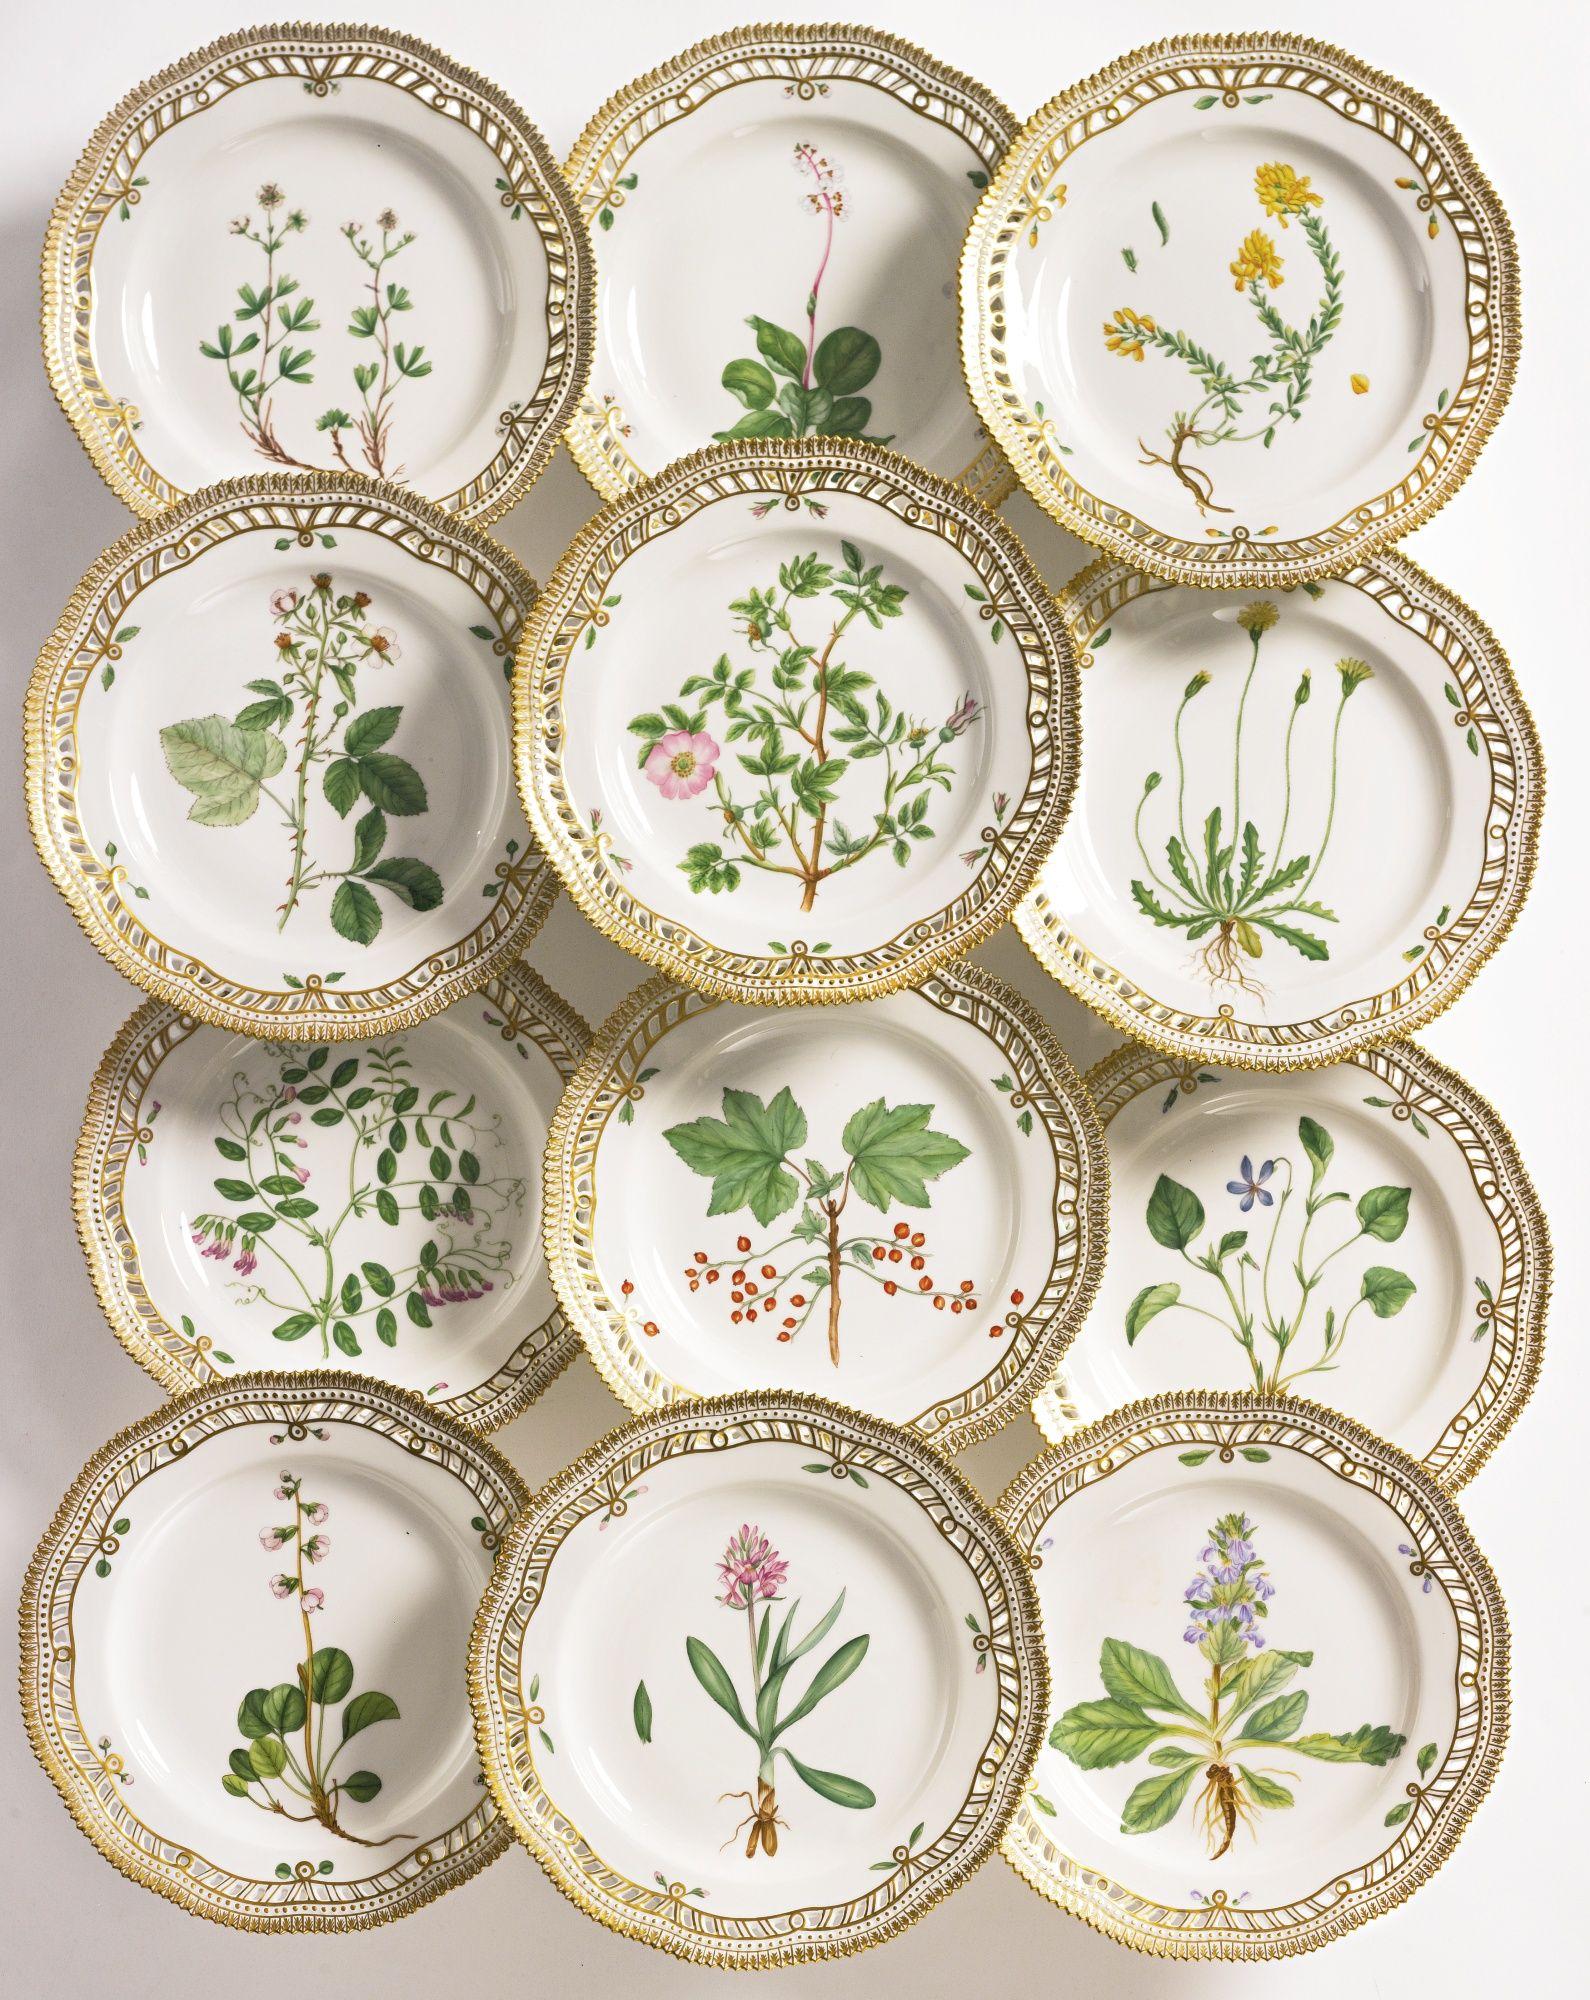 a set of twelve royal copenhagen 'flora danica' reticulated dinner  - a set of twelve royal copenhagen 'flora danica' reticulated dinner platesmodern standard printed